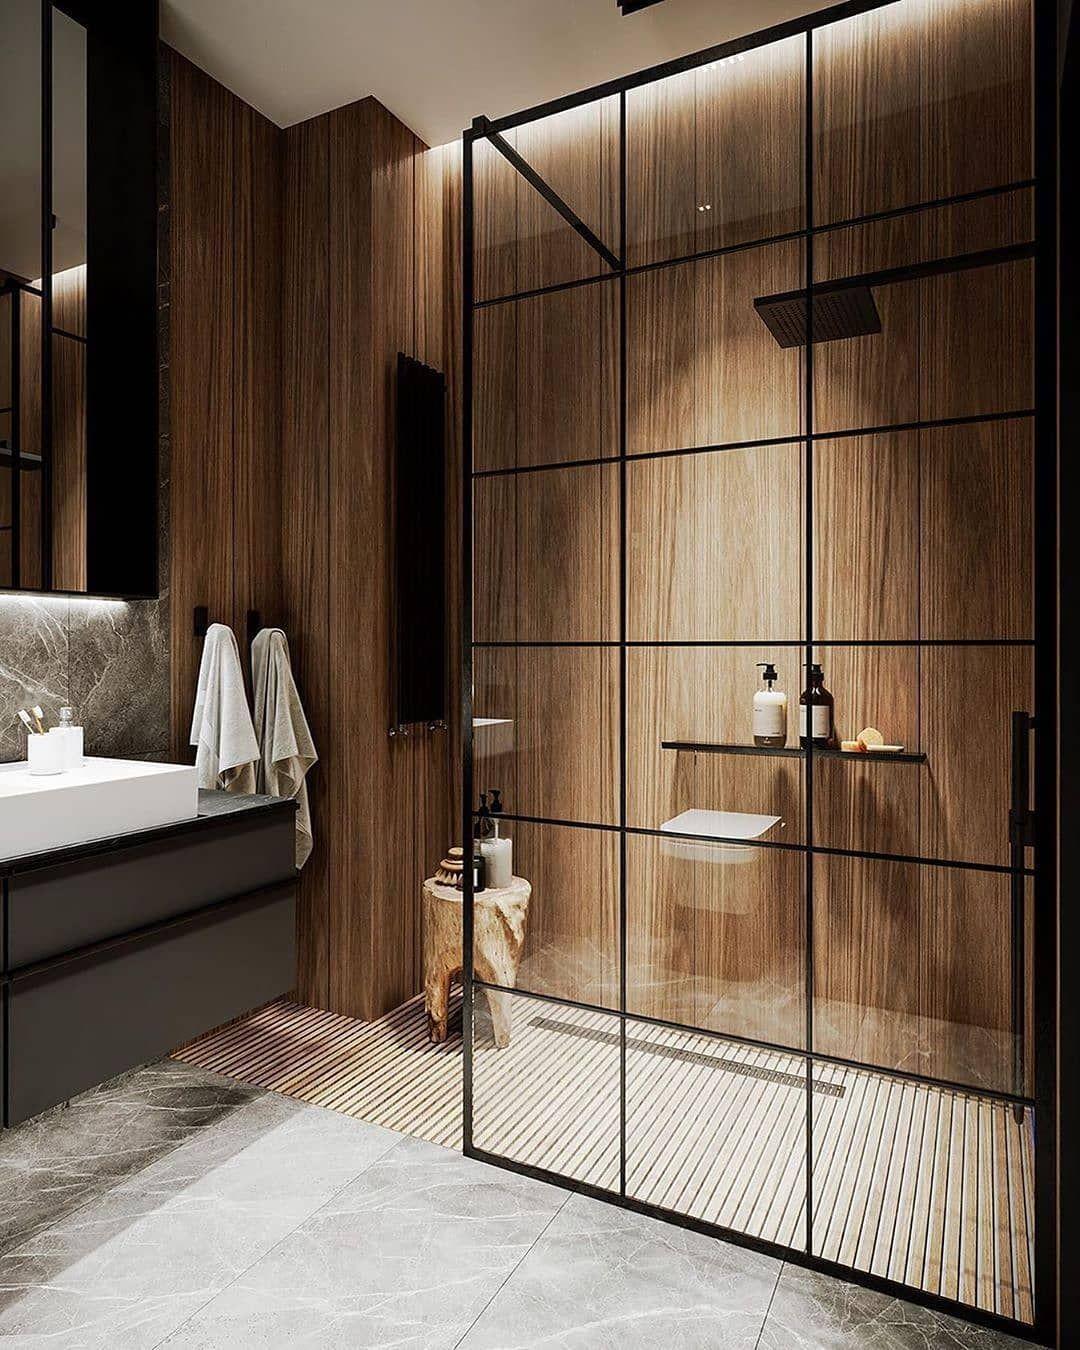 Pin On Bathroom Ideas Luxury bathroom design examples